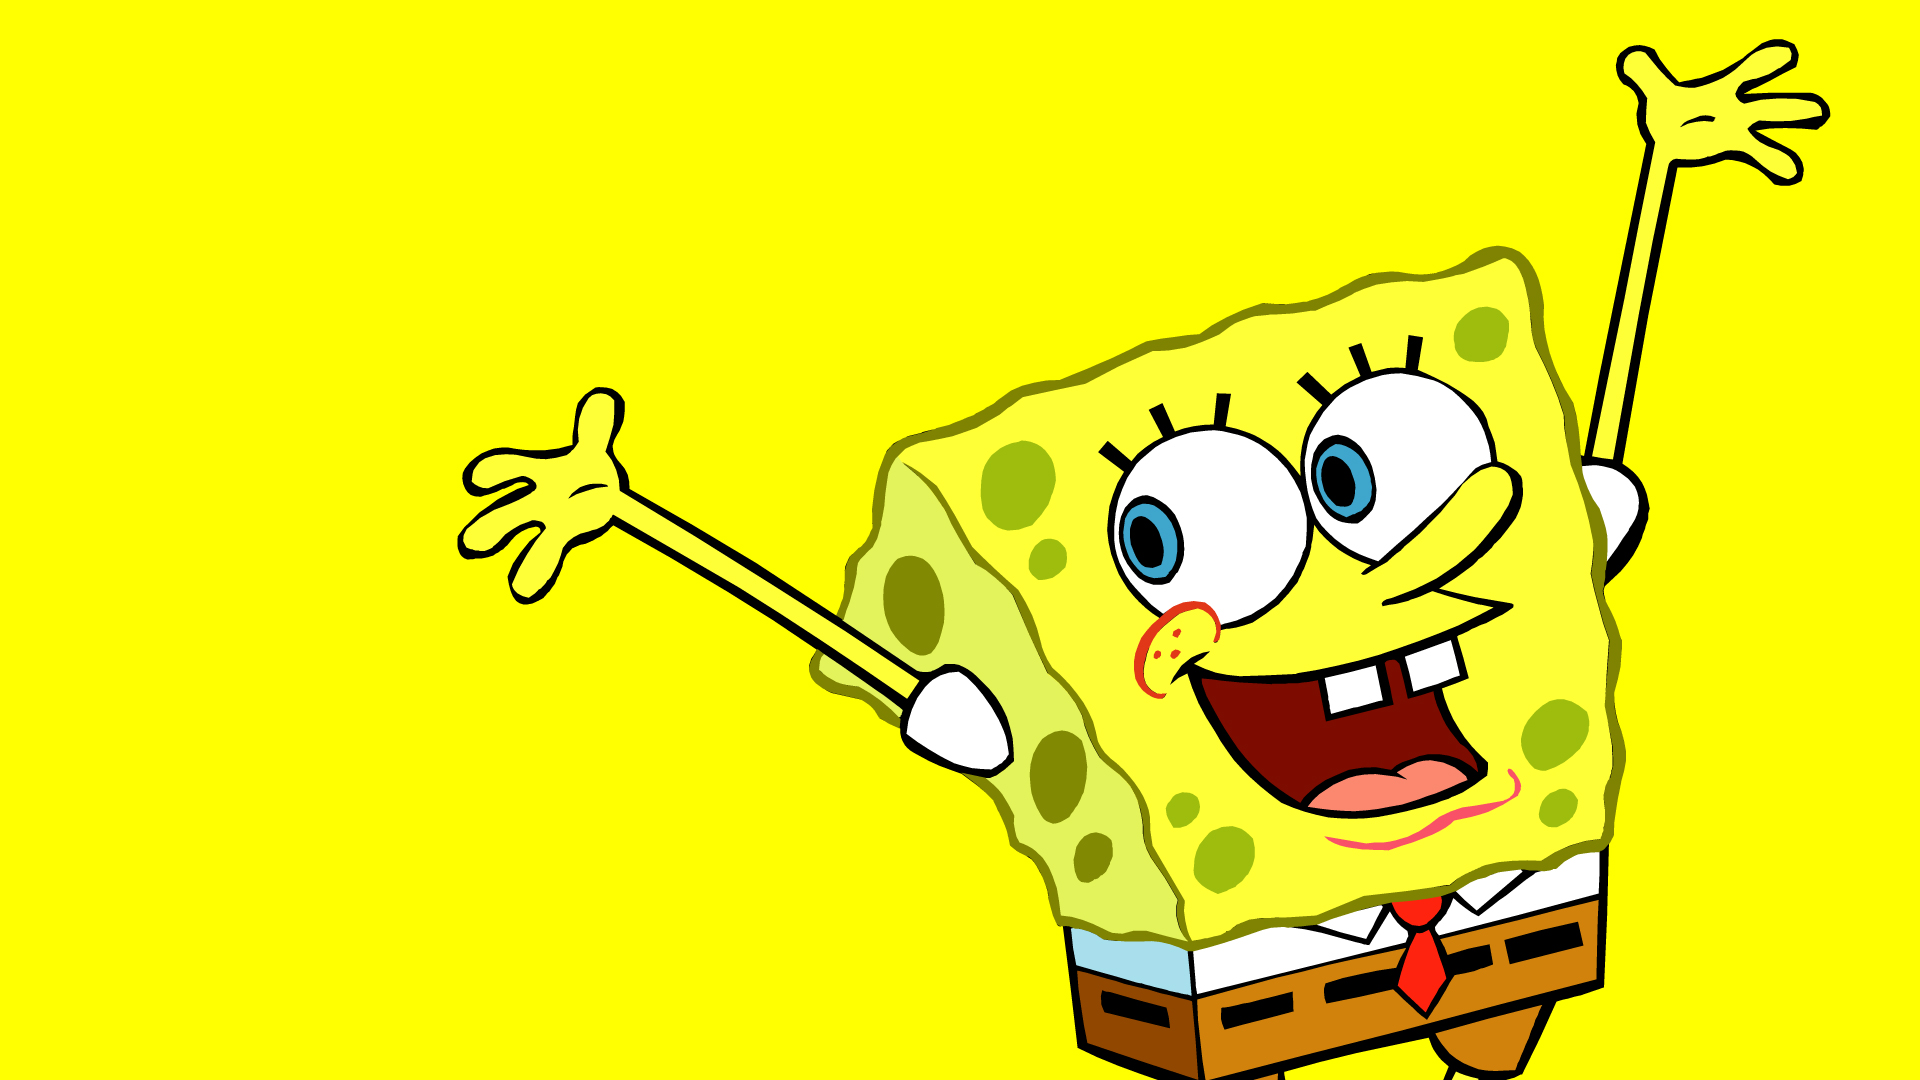 SpongeBob Wallpaper HD 1920 x 1080 1920x1080